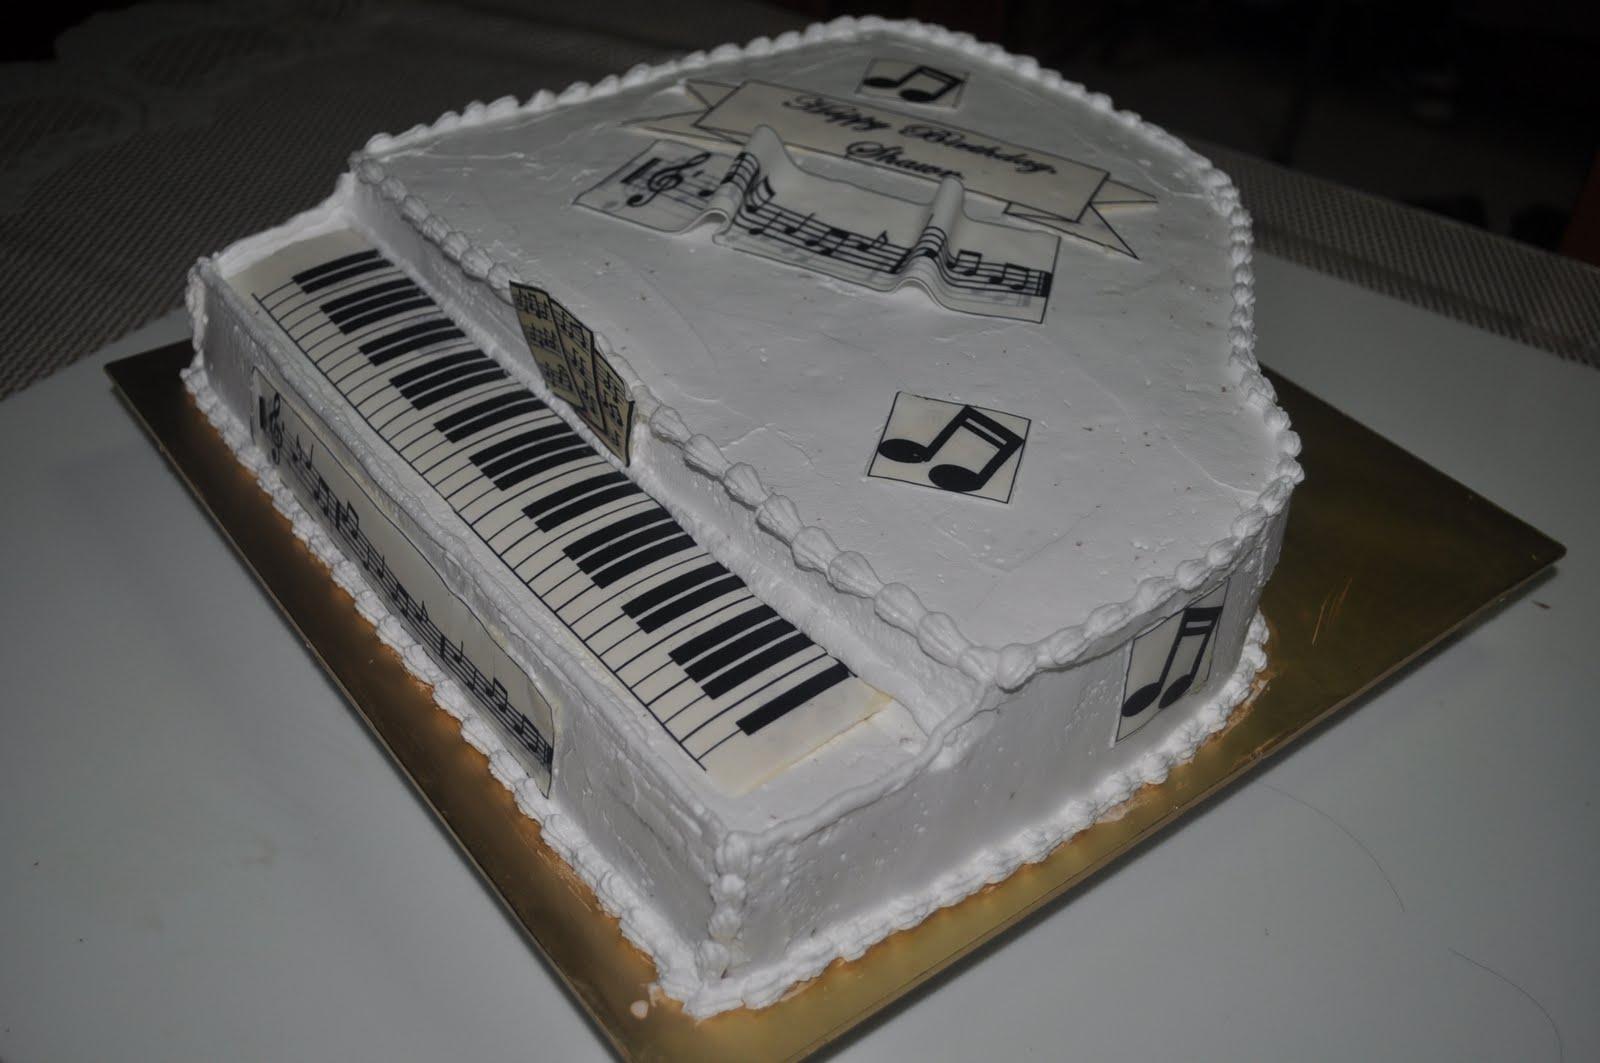 Izah's Kitchen: 3D Piano Cake